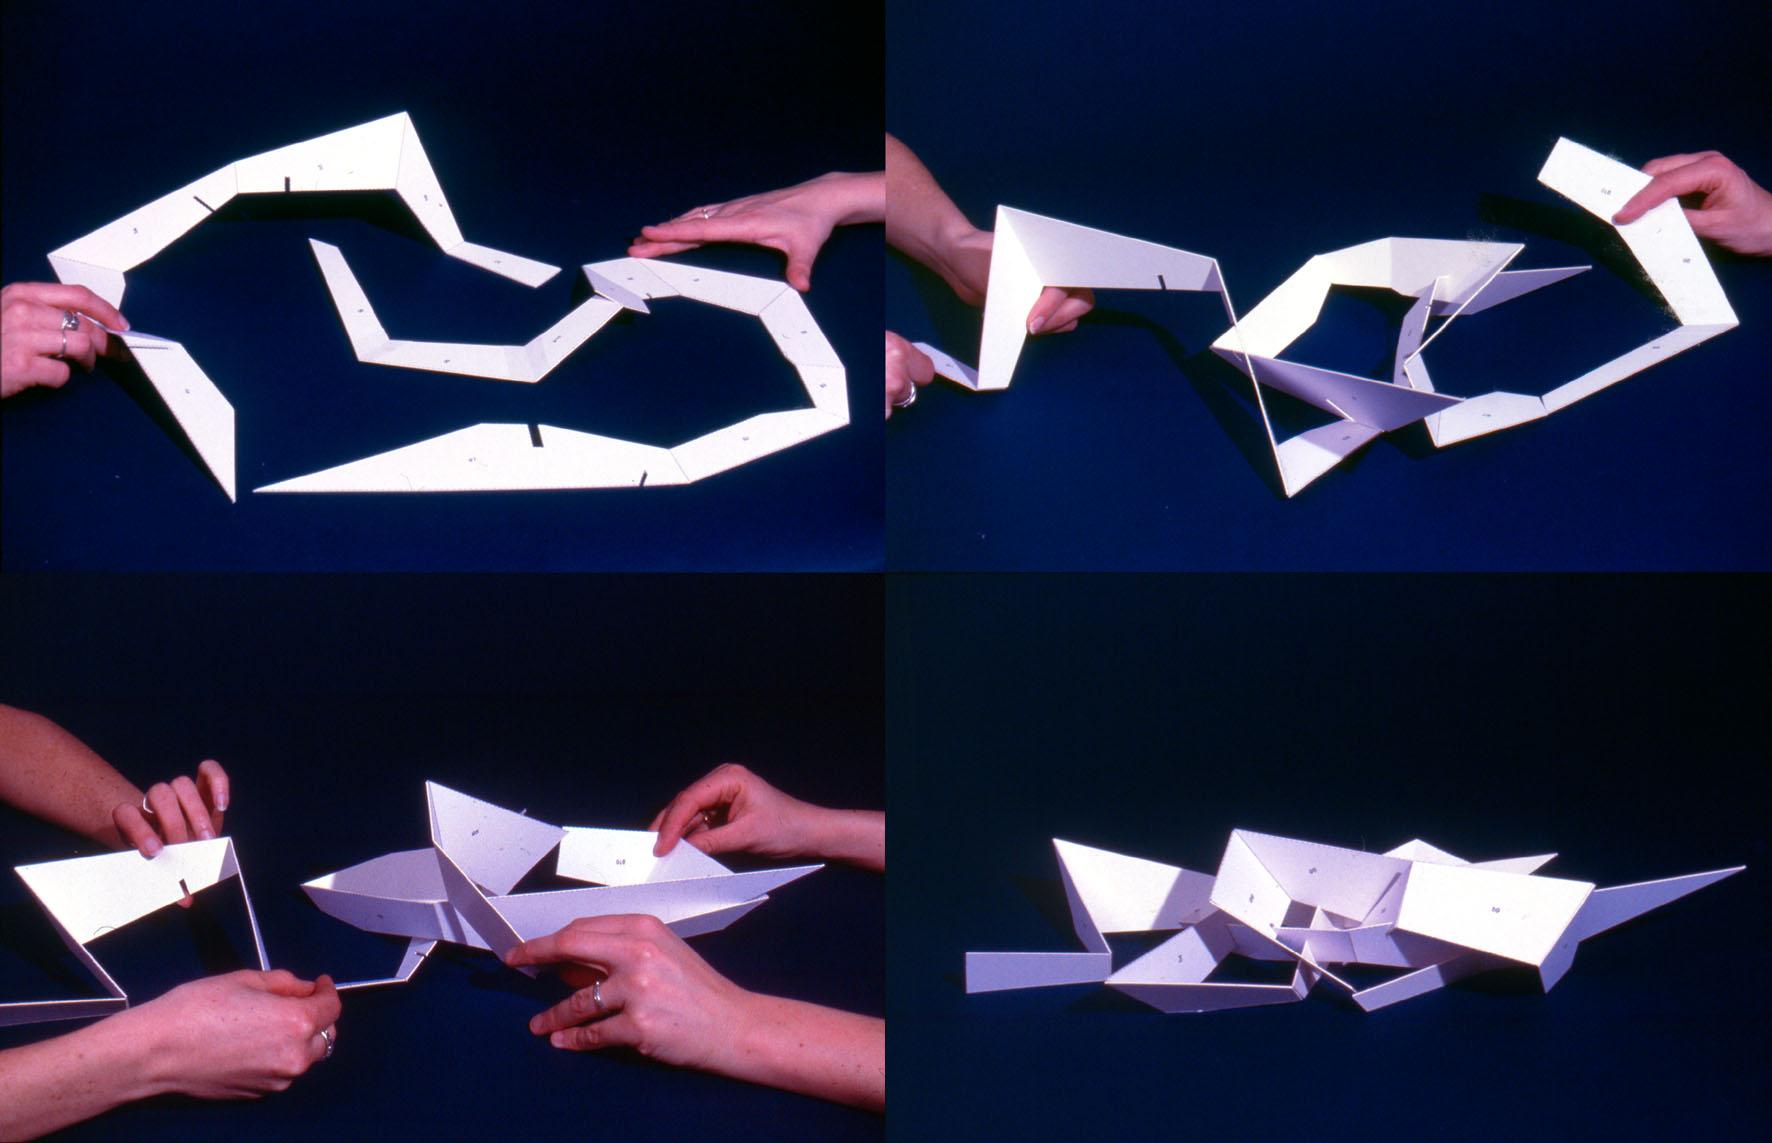 Daniel Libeskind Denver Art Museum CNN Documentary  Libeskind